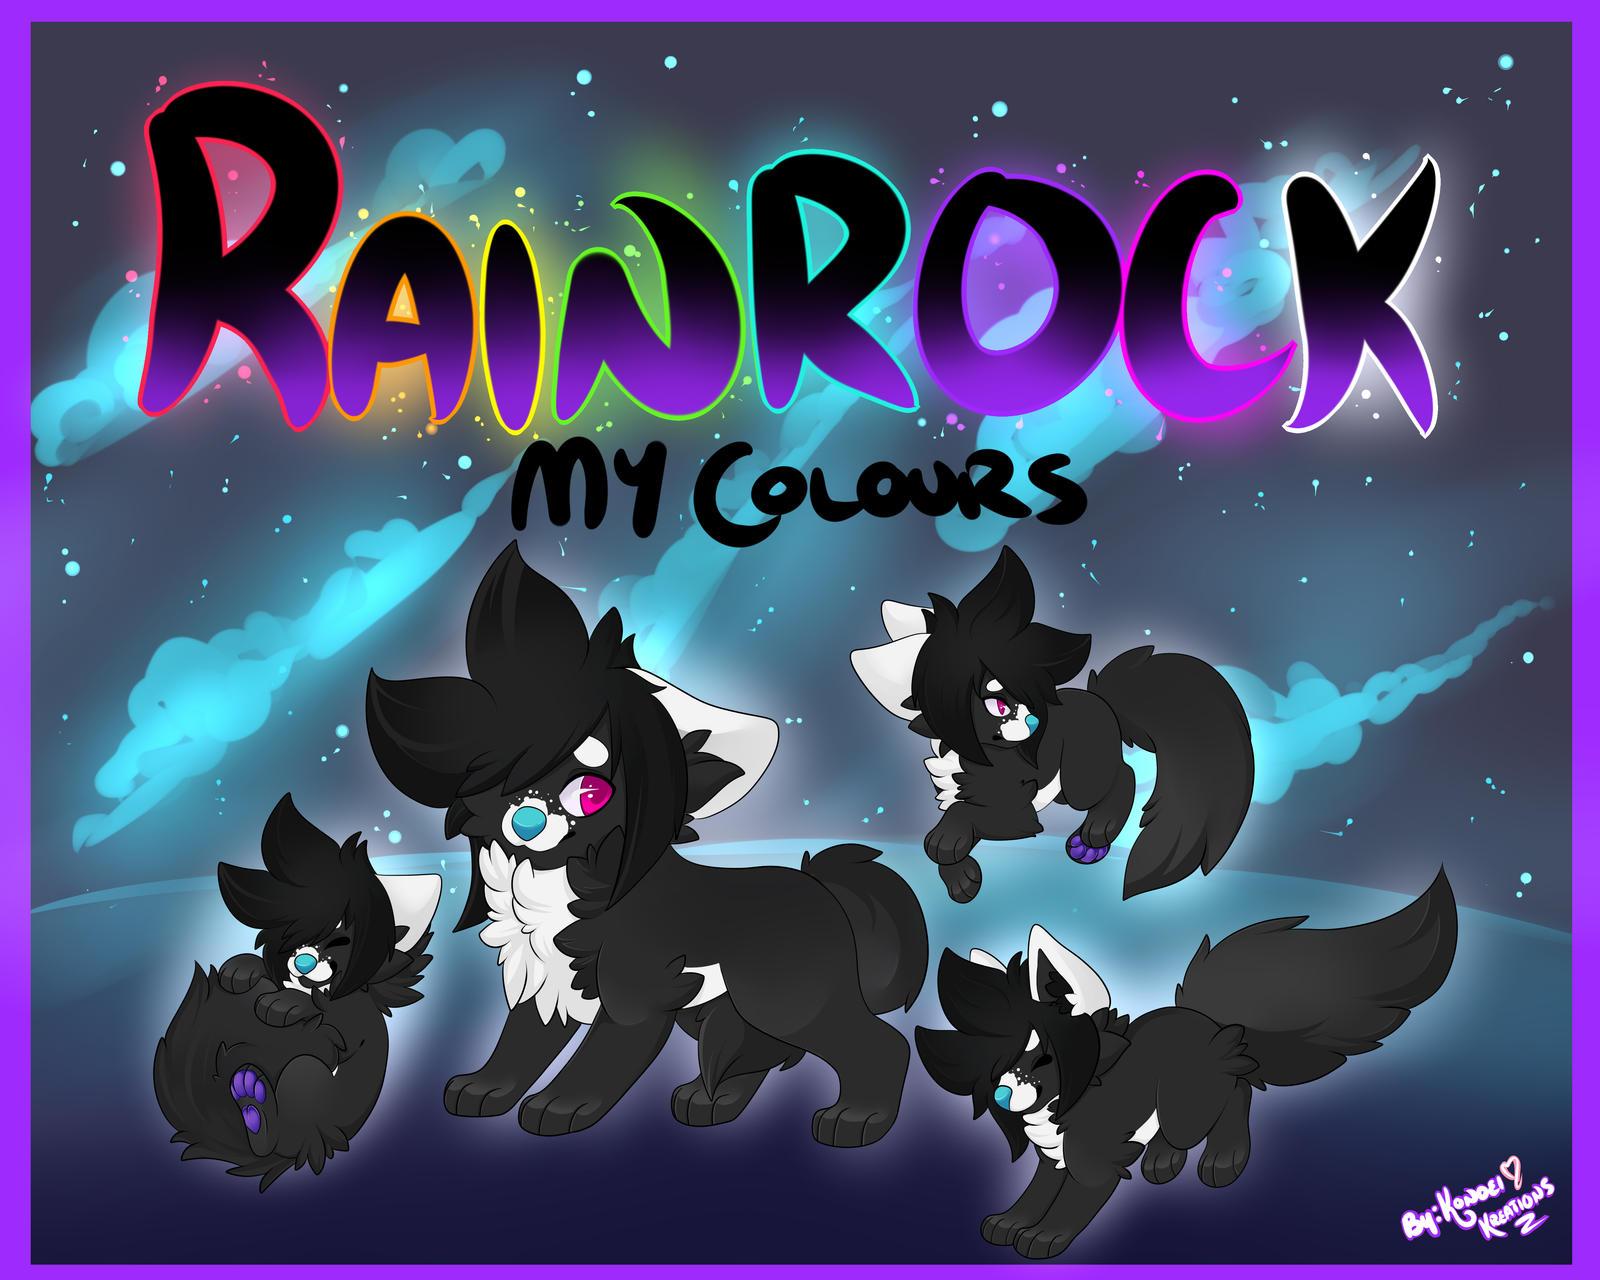 rainrock__my_colours_by_konoei_kreations